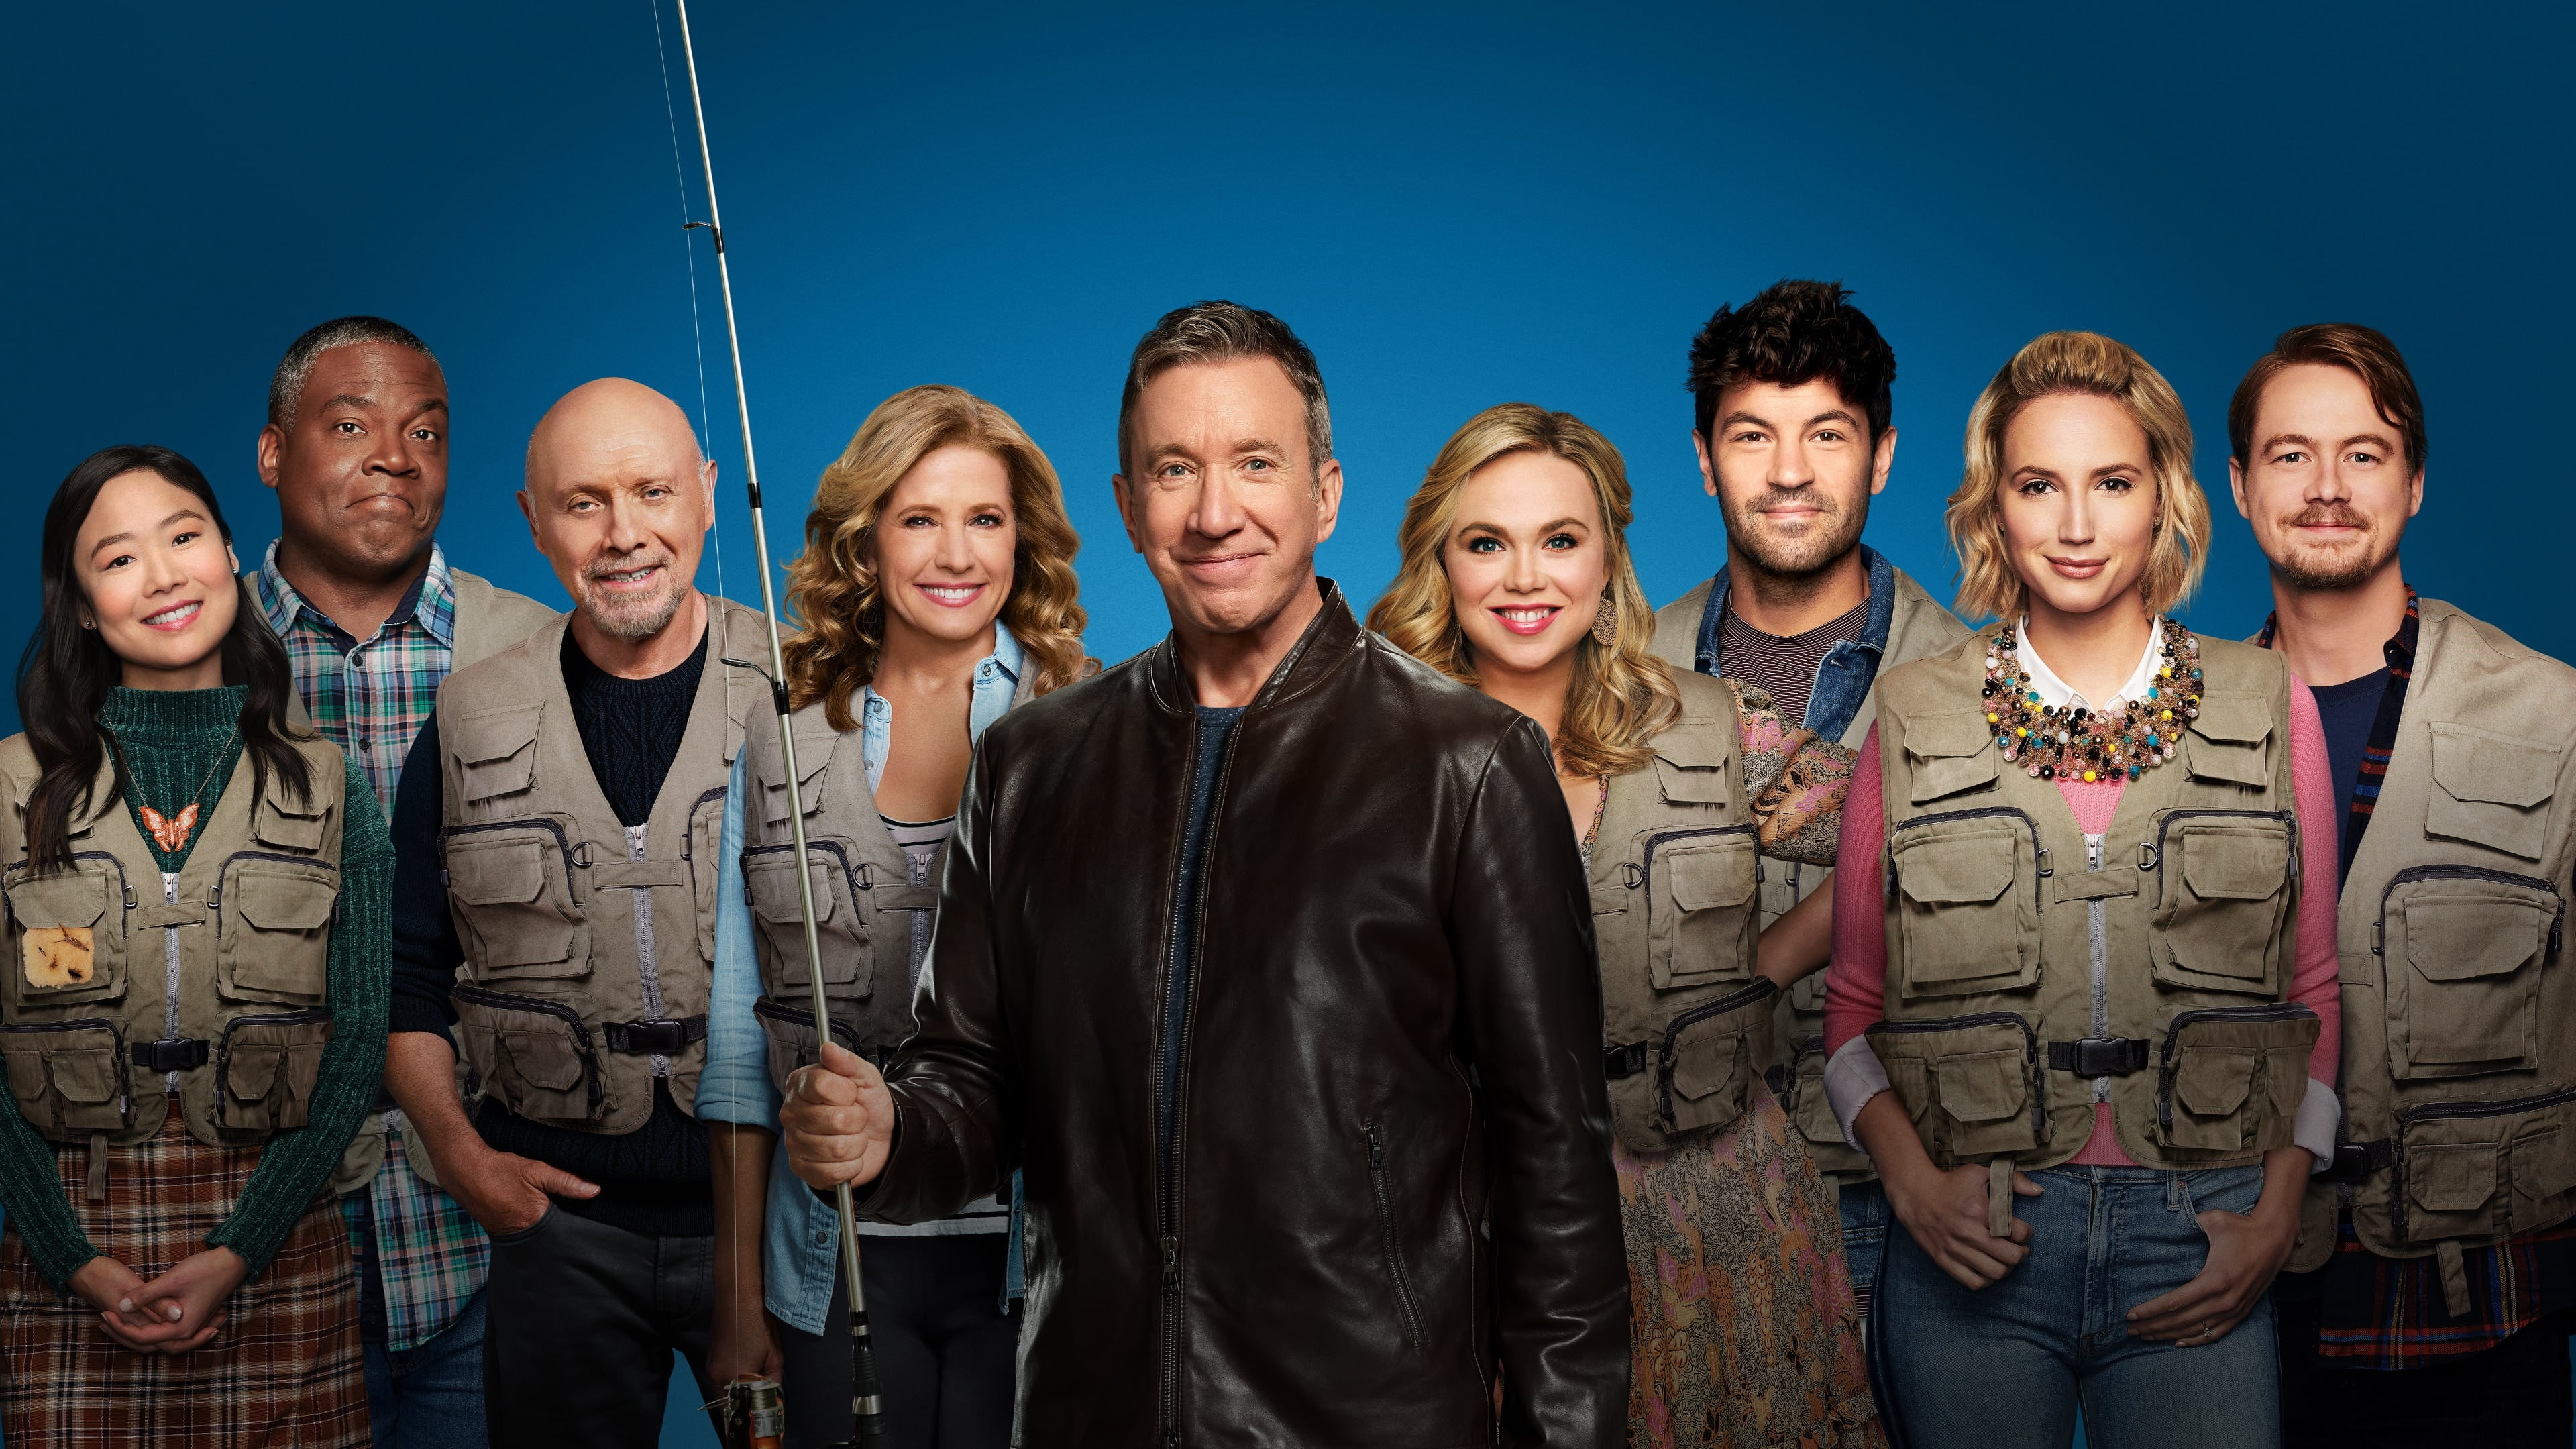 Last Man Standing Stream Full Episodes On Fox